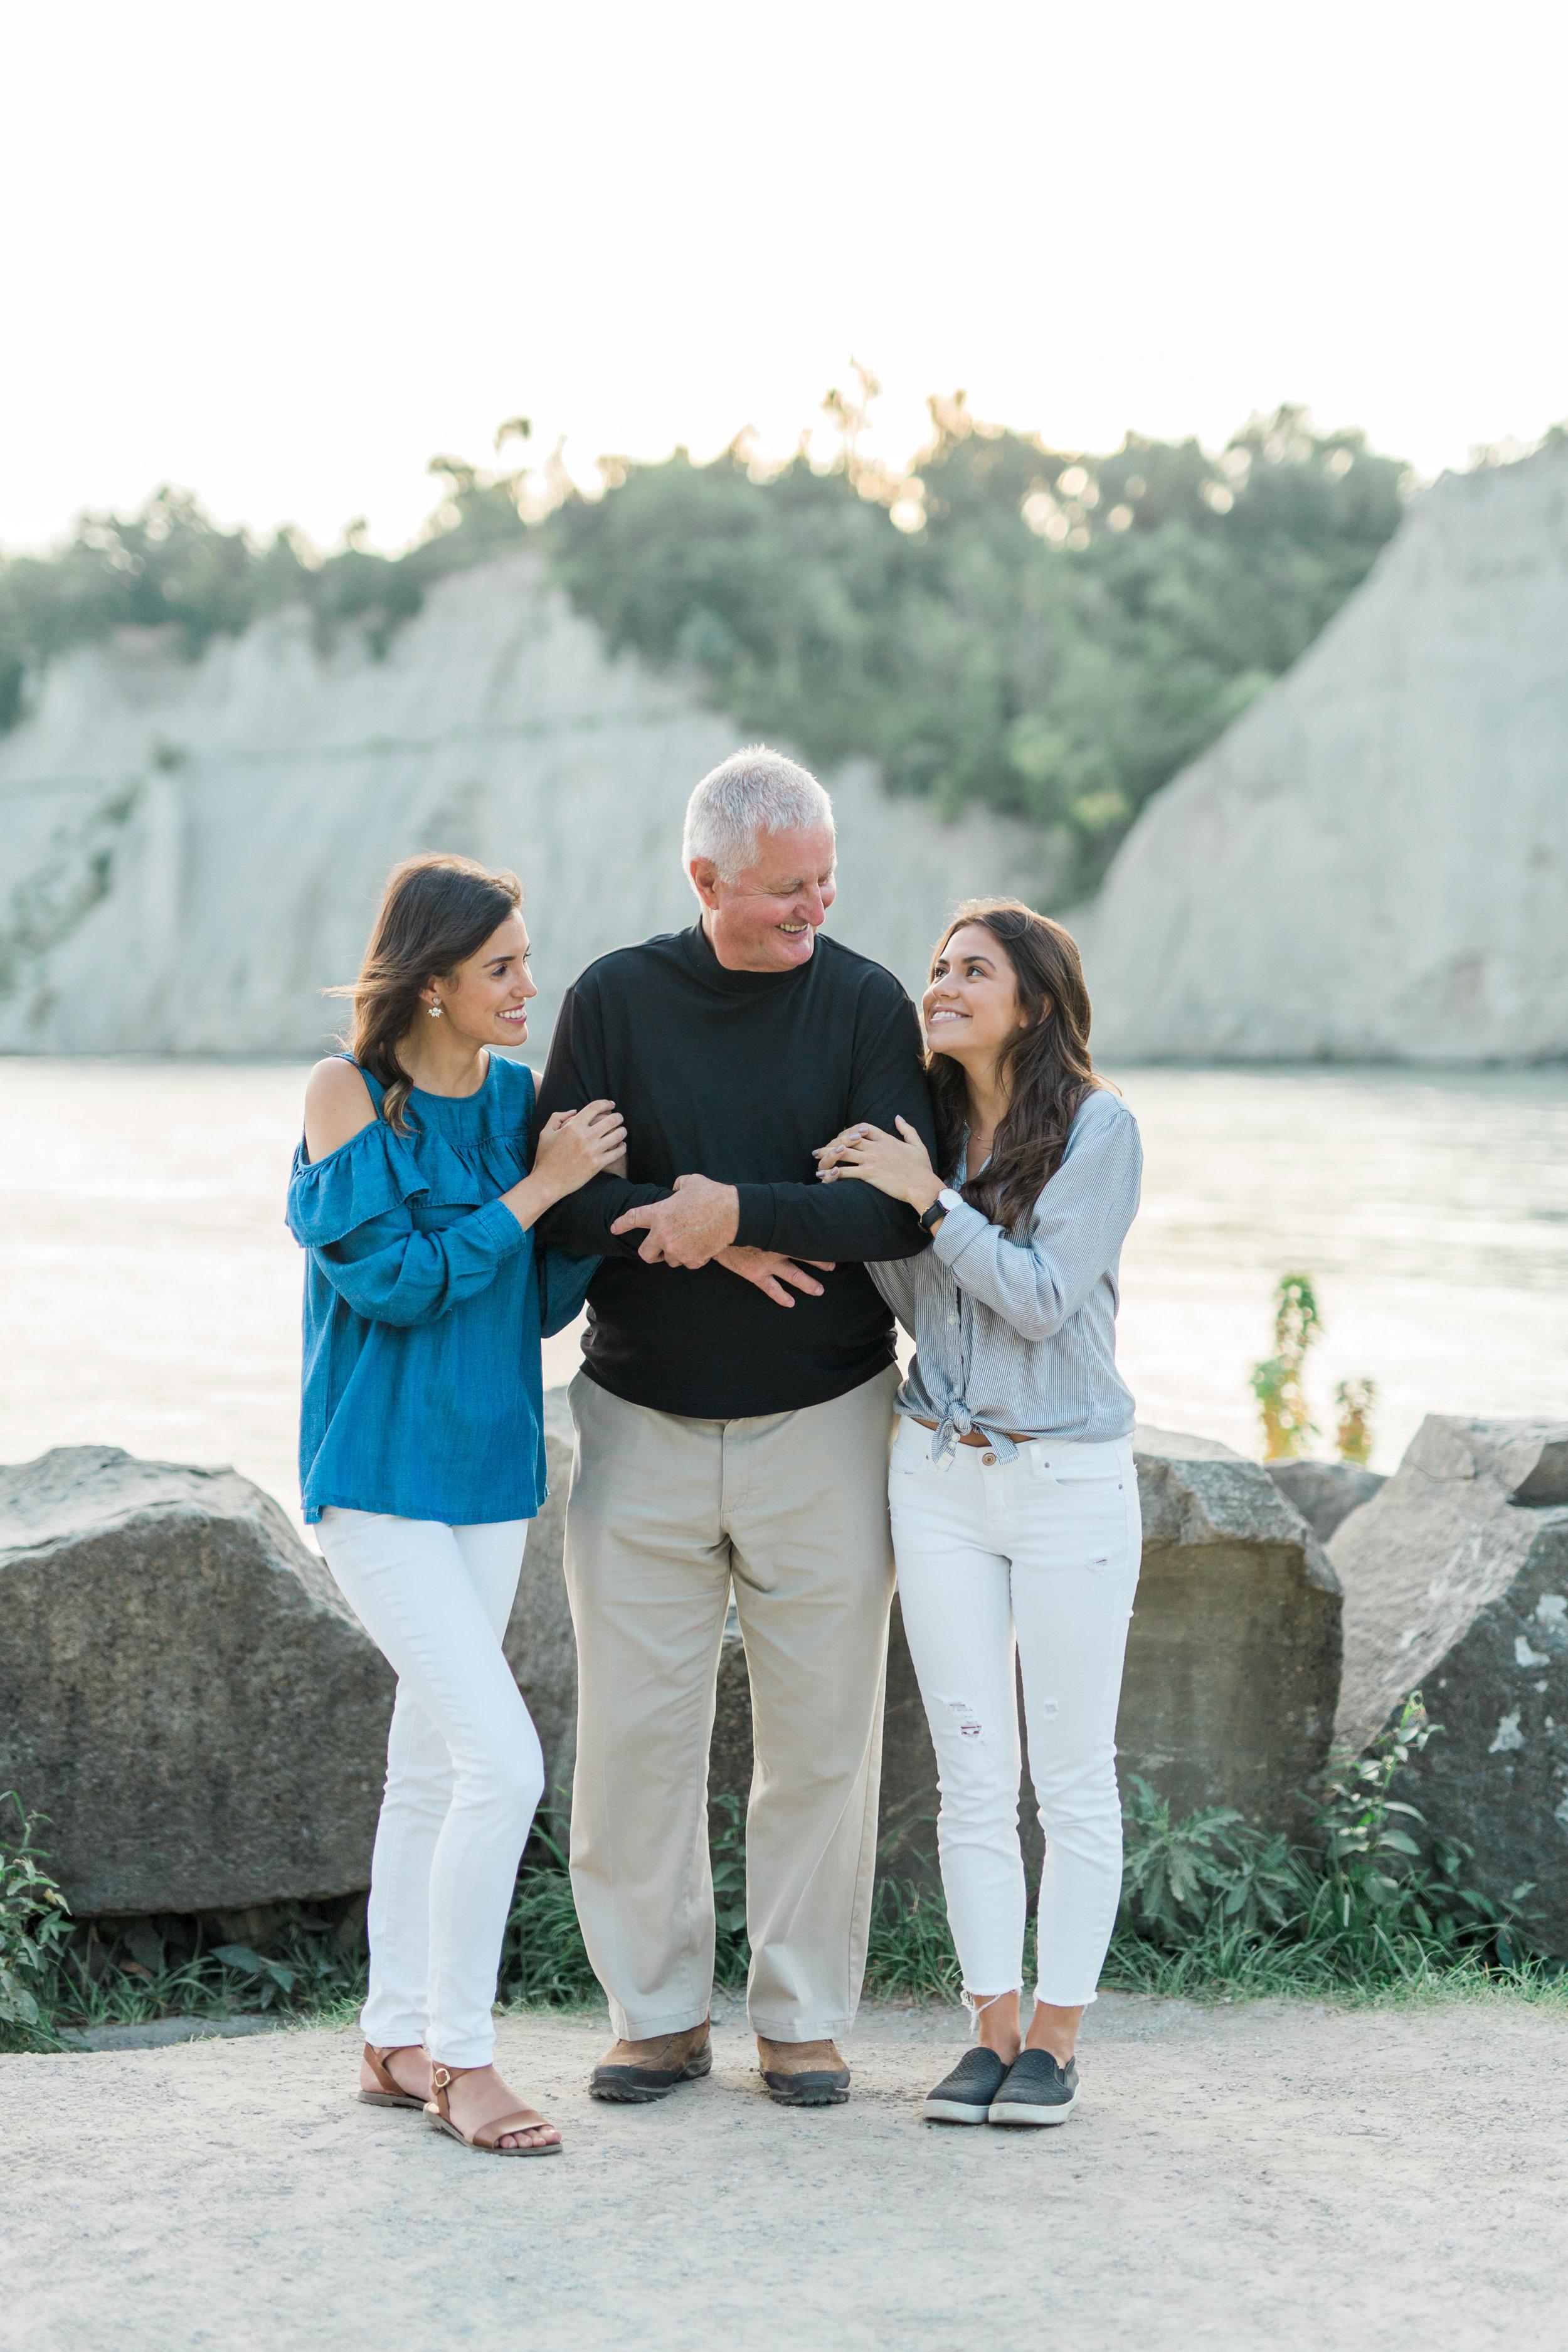 Danielle-Giroux-Amir-Golbazi-Genua-Family-Photography-Scarborough-Bluffs-9463.jpg